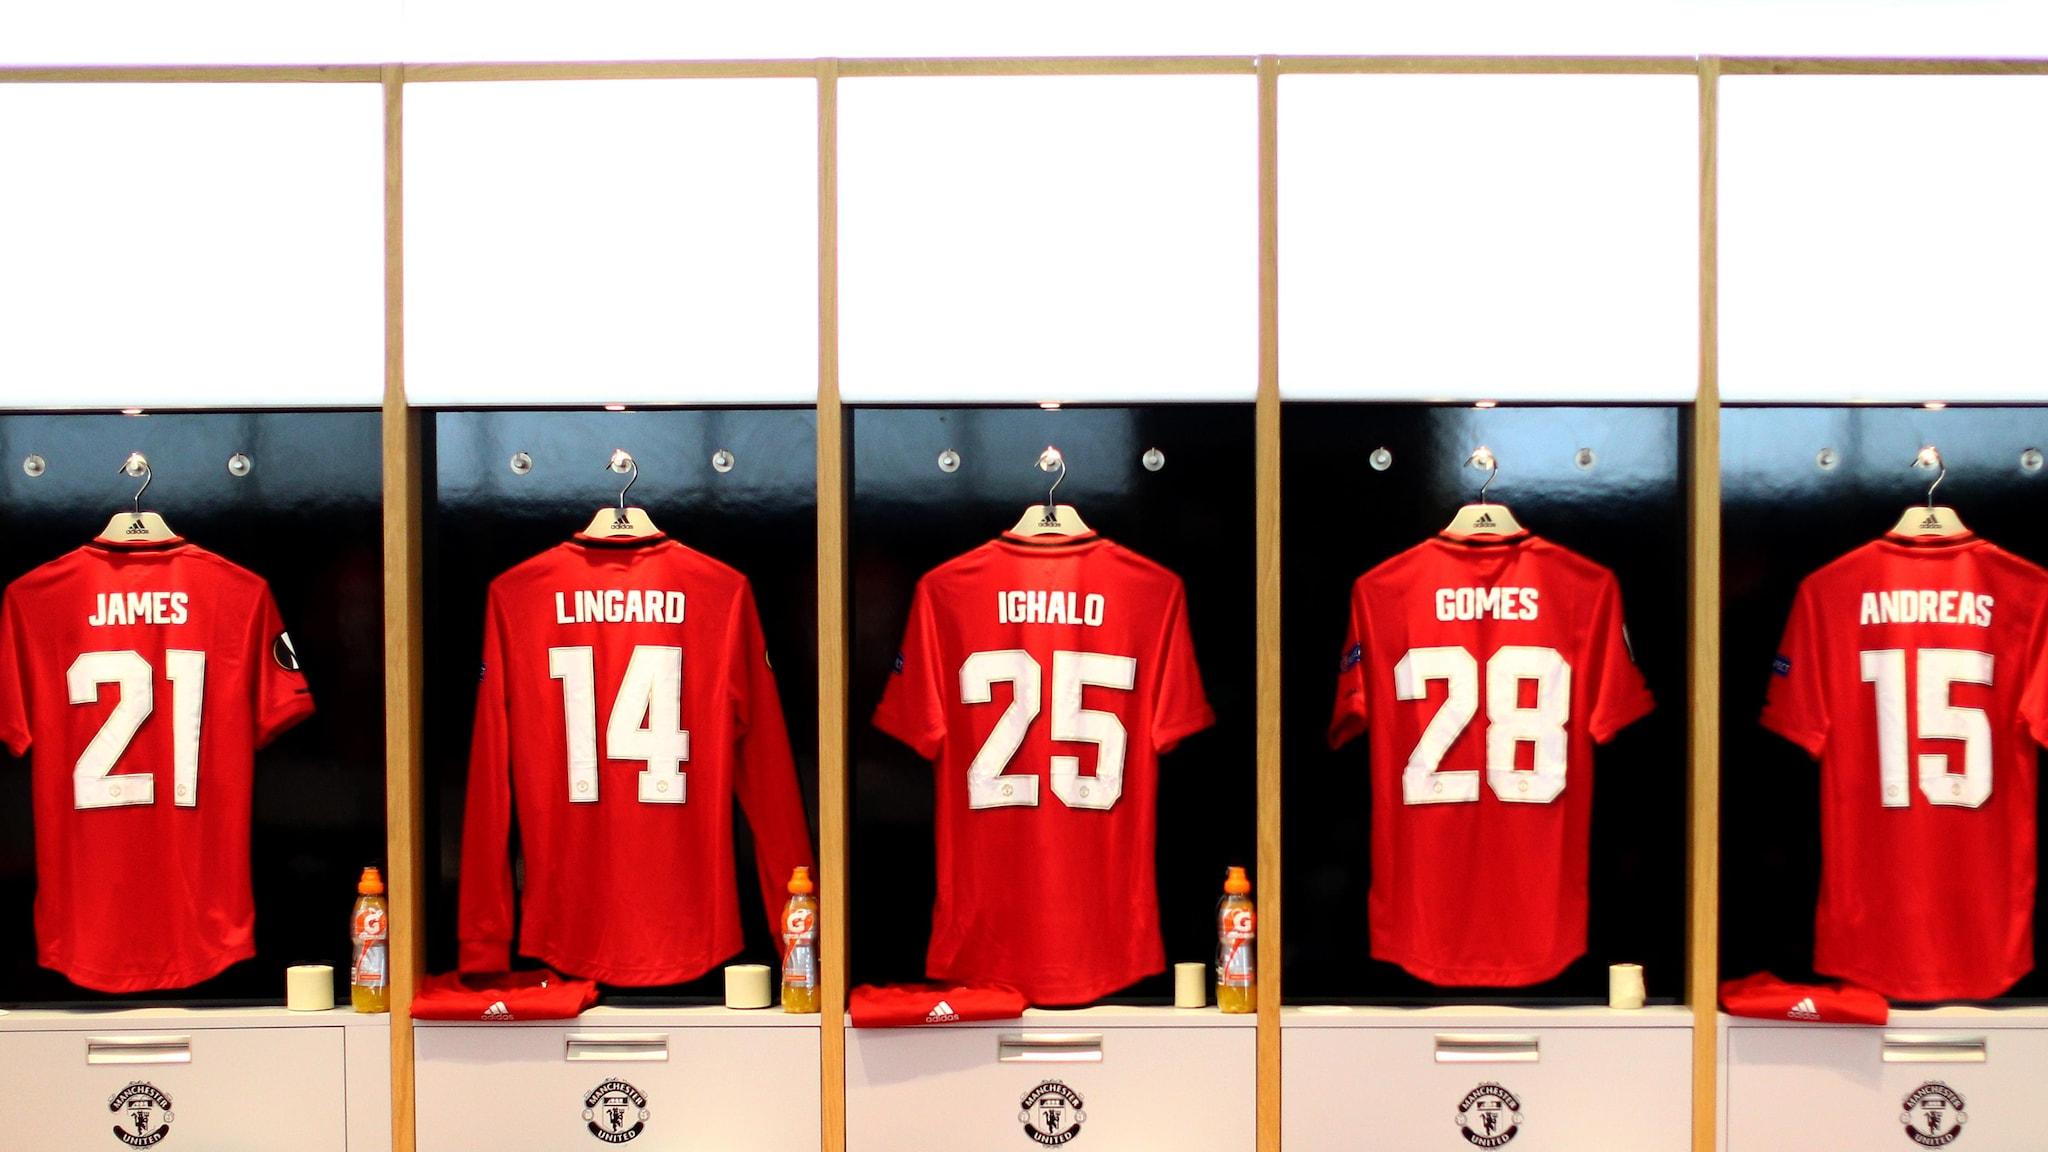 Man United Club Brugge